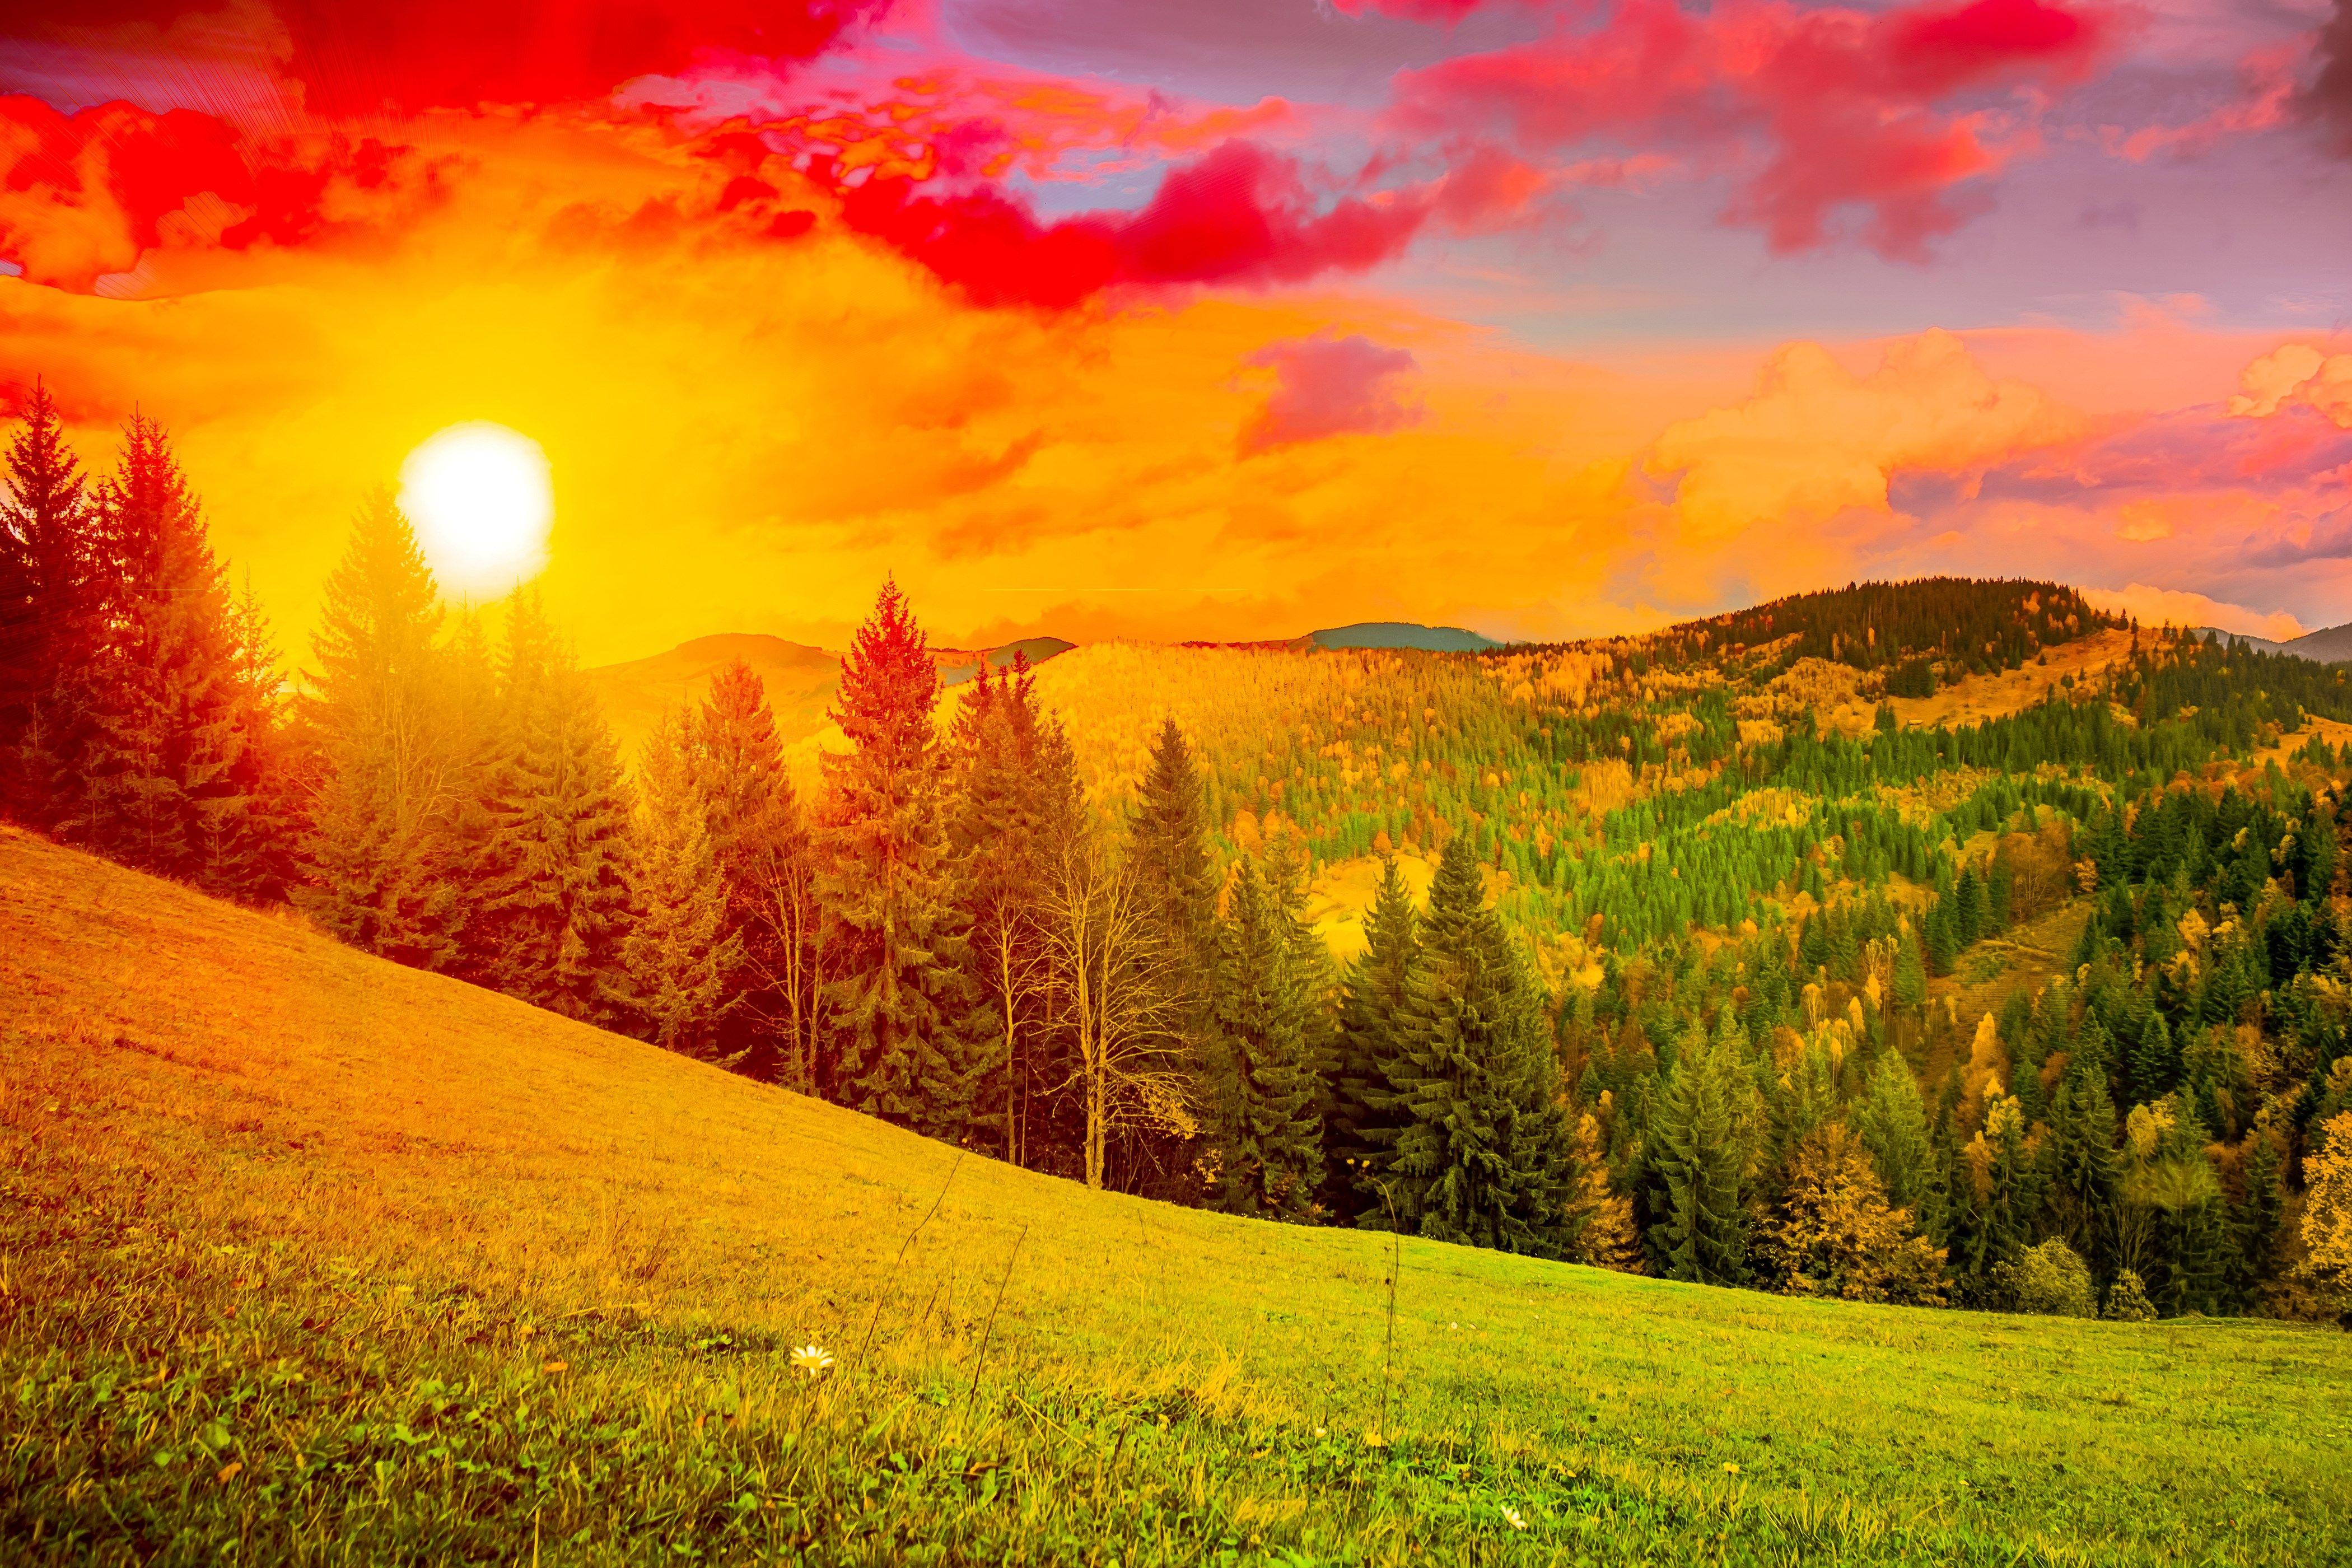 Colorful Sunrise Mountain Landscape HD Wide Wallpaper For Widescreen